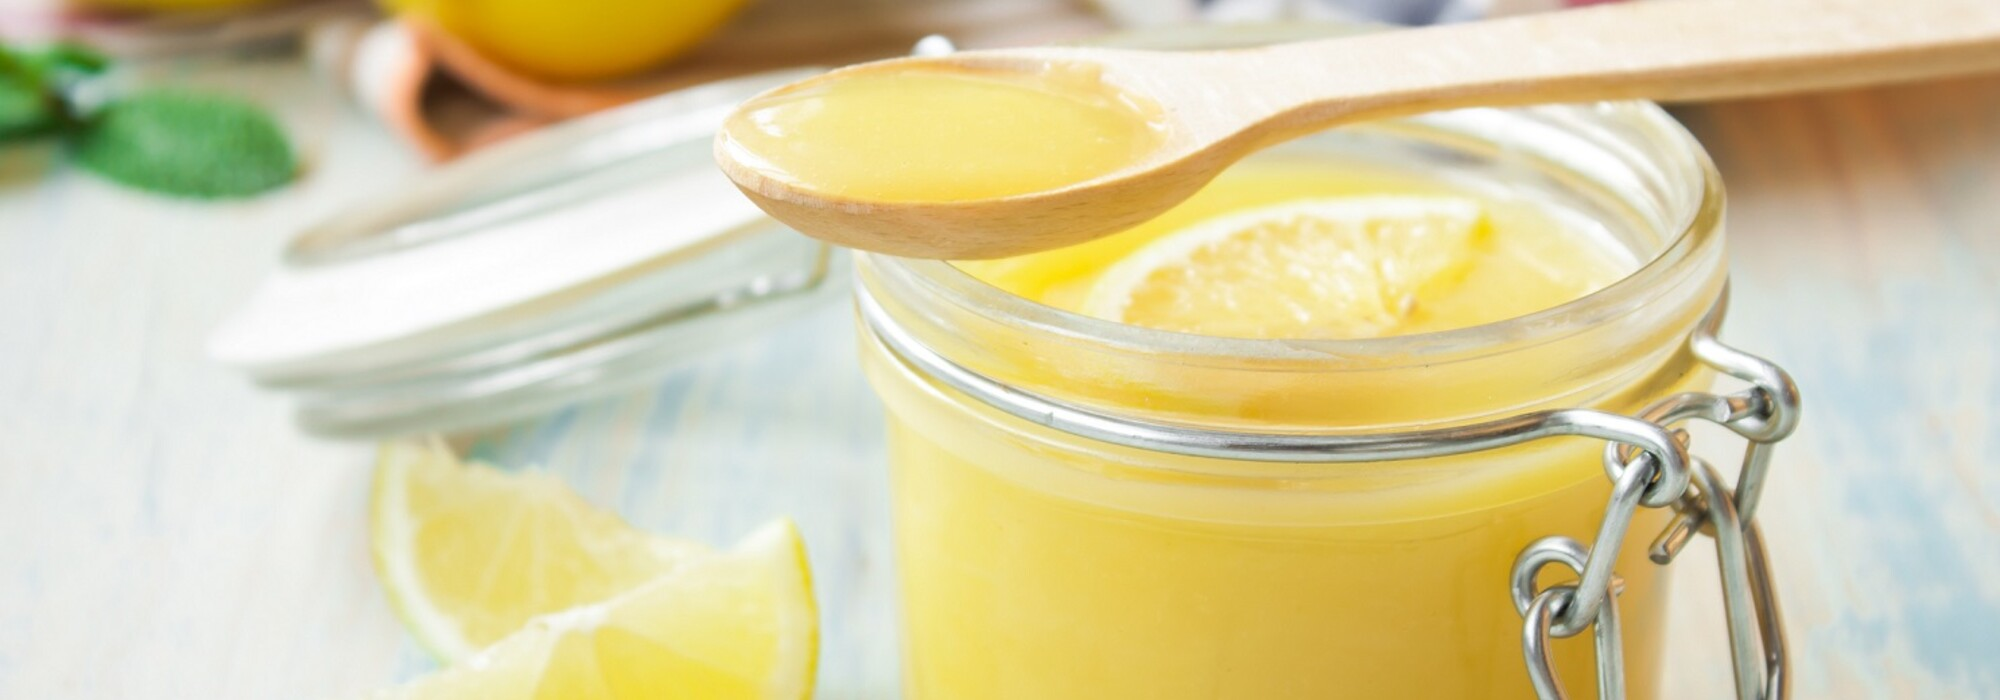 Suikervrije en koolhydraatarme Lemon Curd